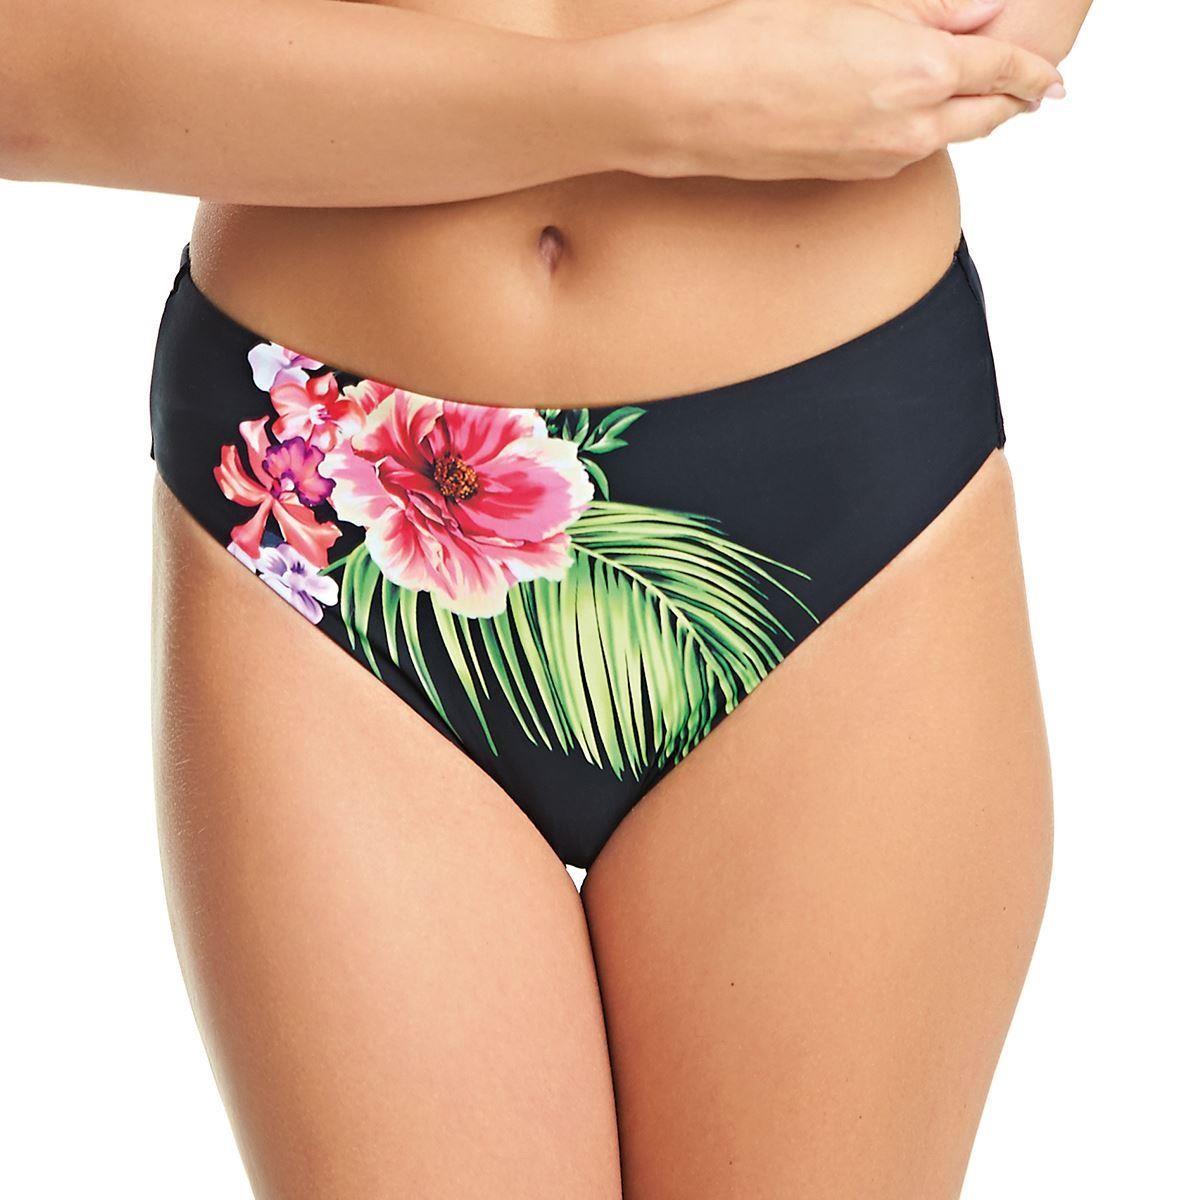 Fantasie Mustique Mid Rise Bikini Brief - Multi